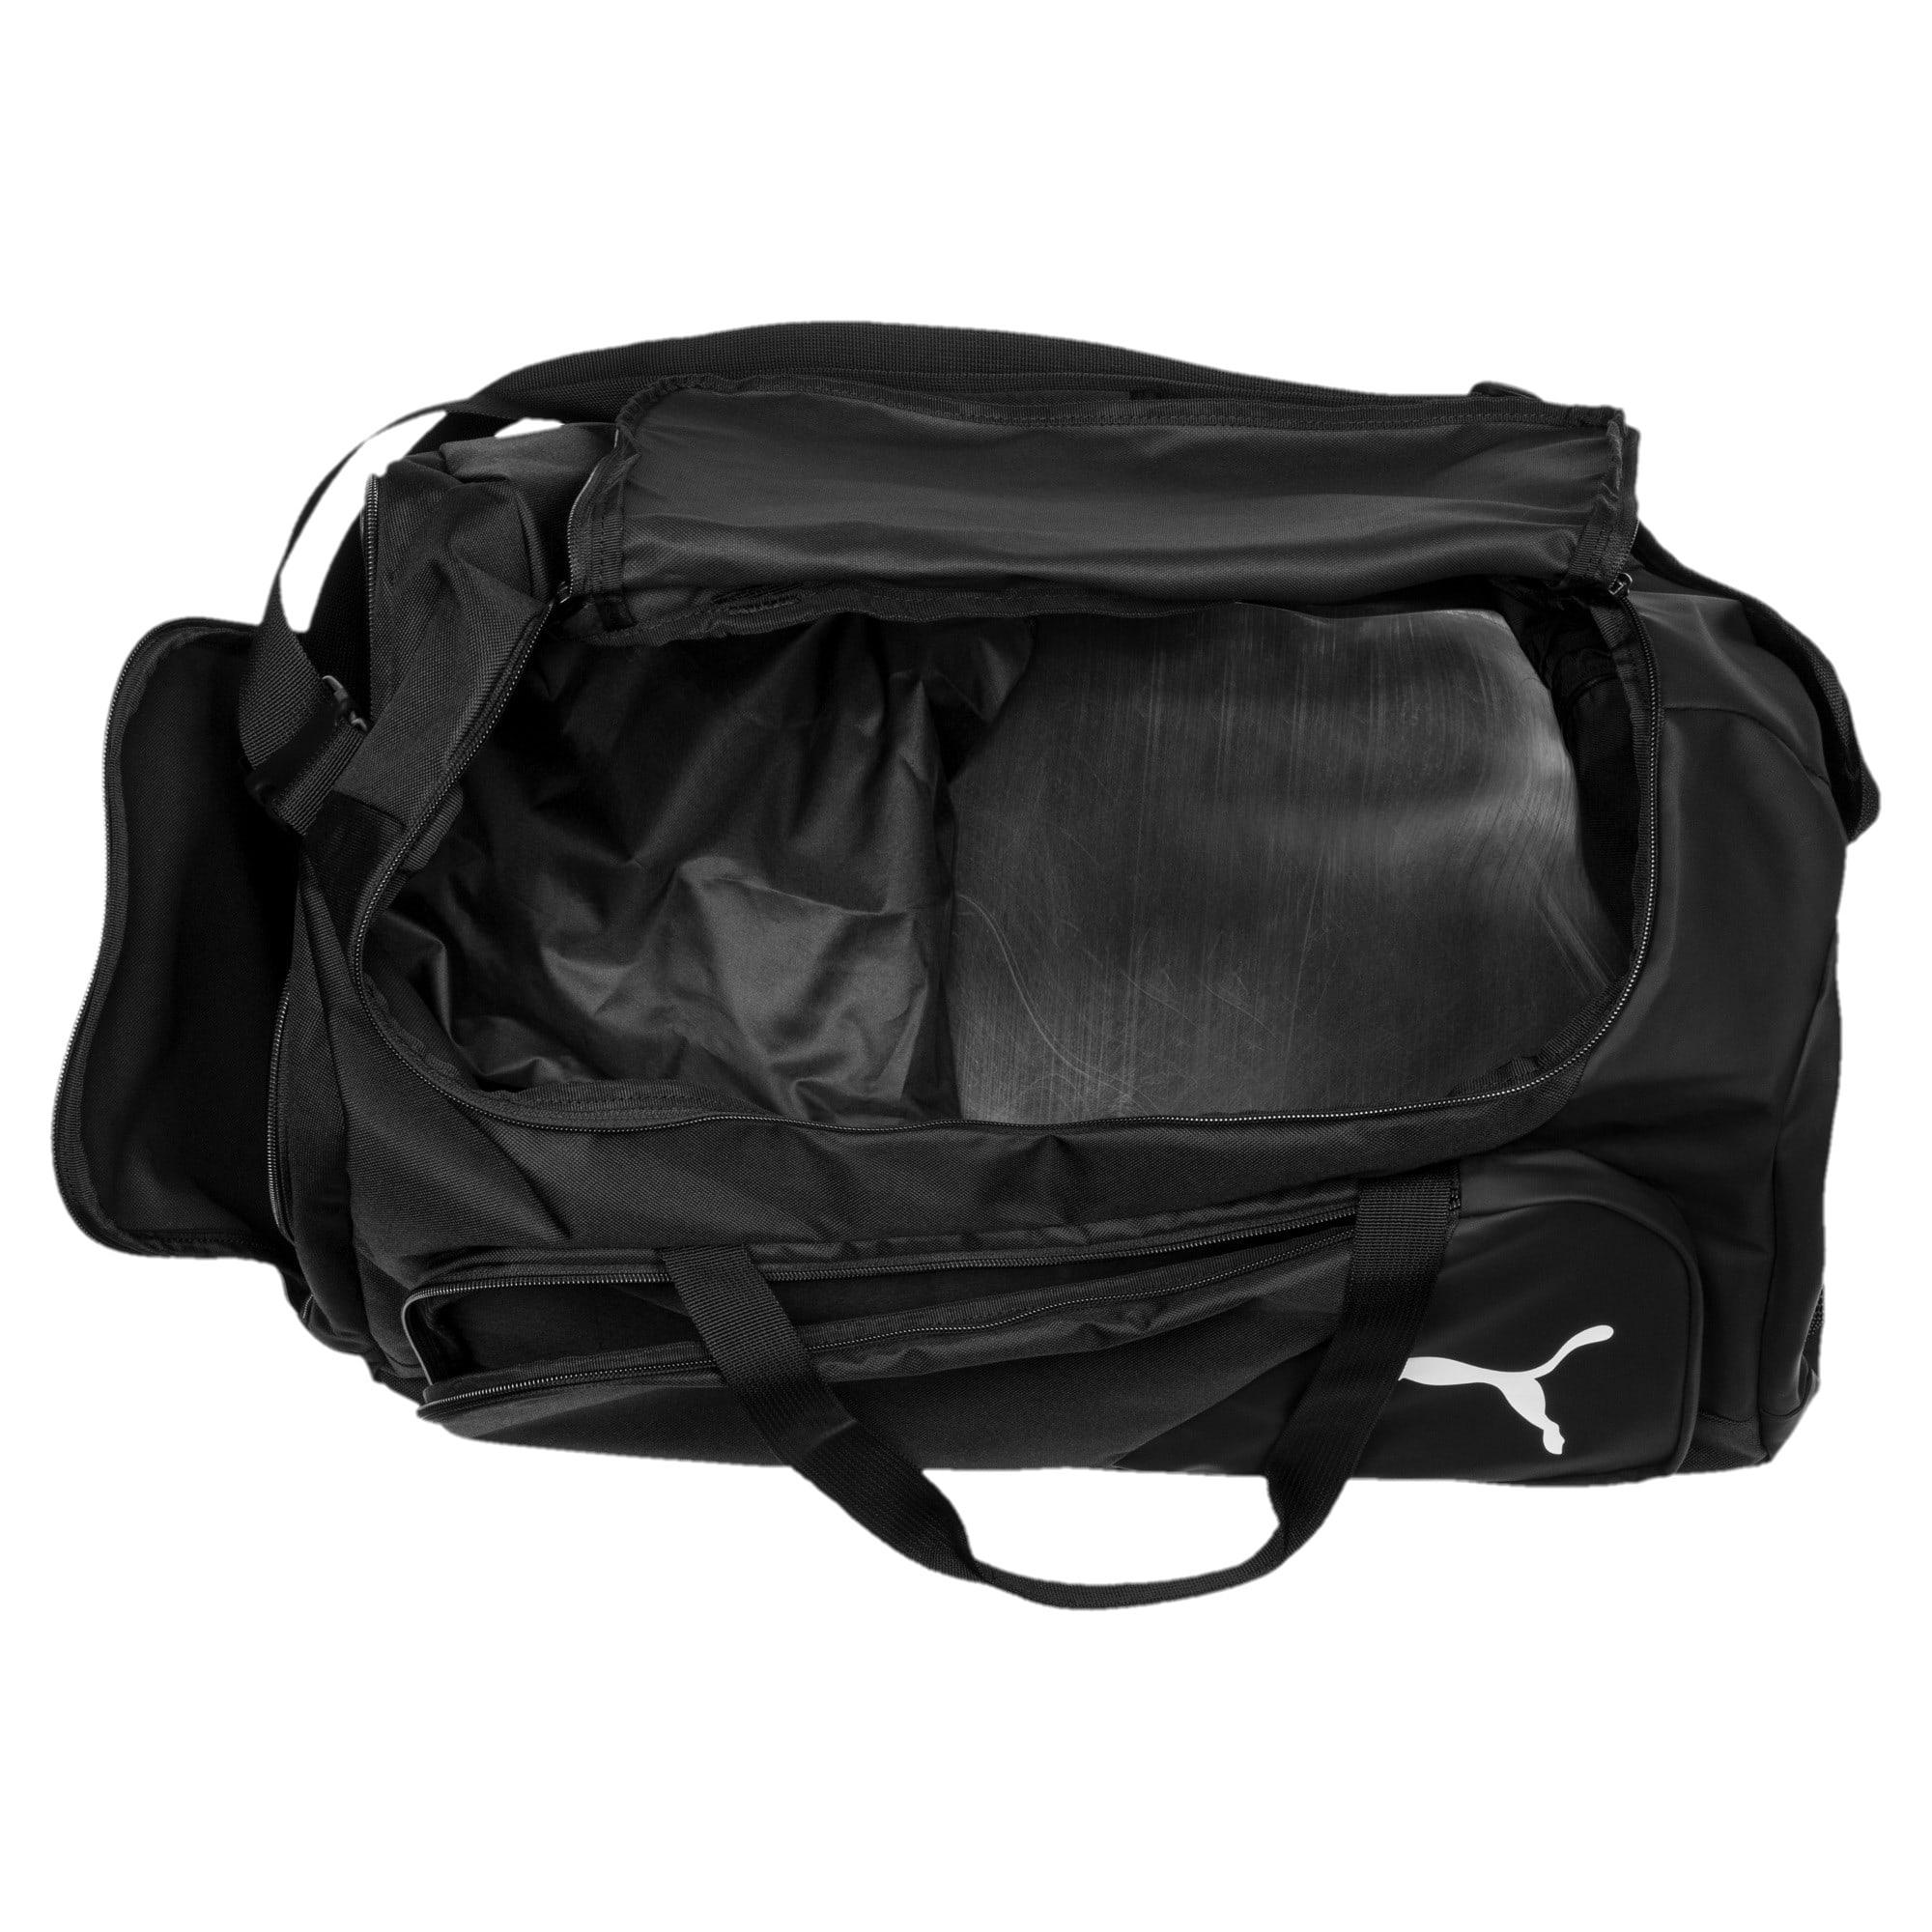 Thumbnail 3 of Liga Medium Bag, Puma Black, medium